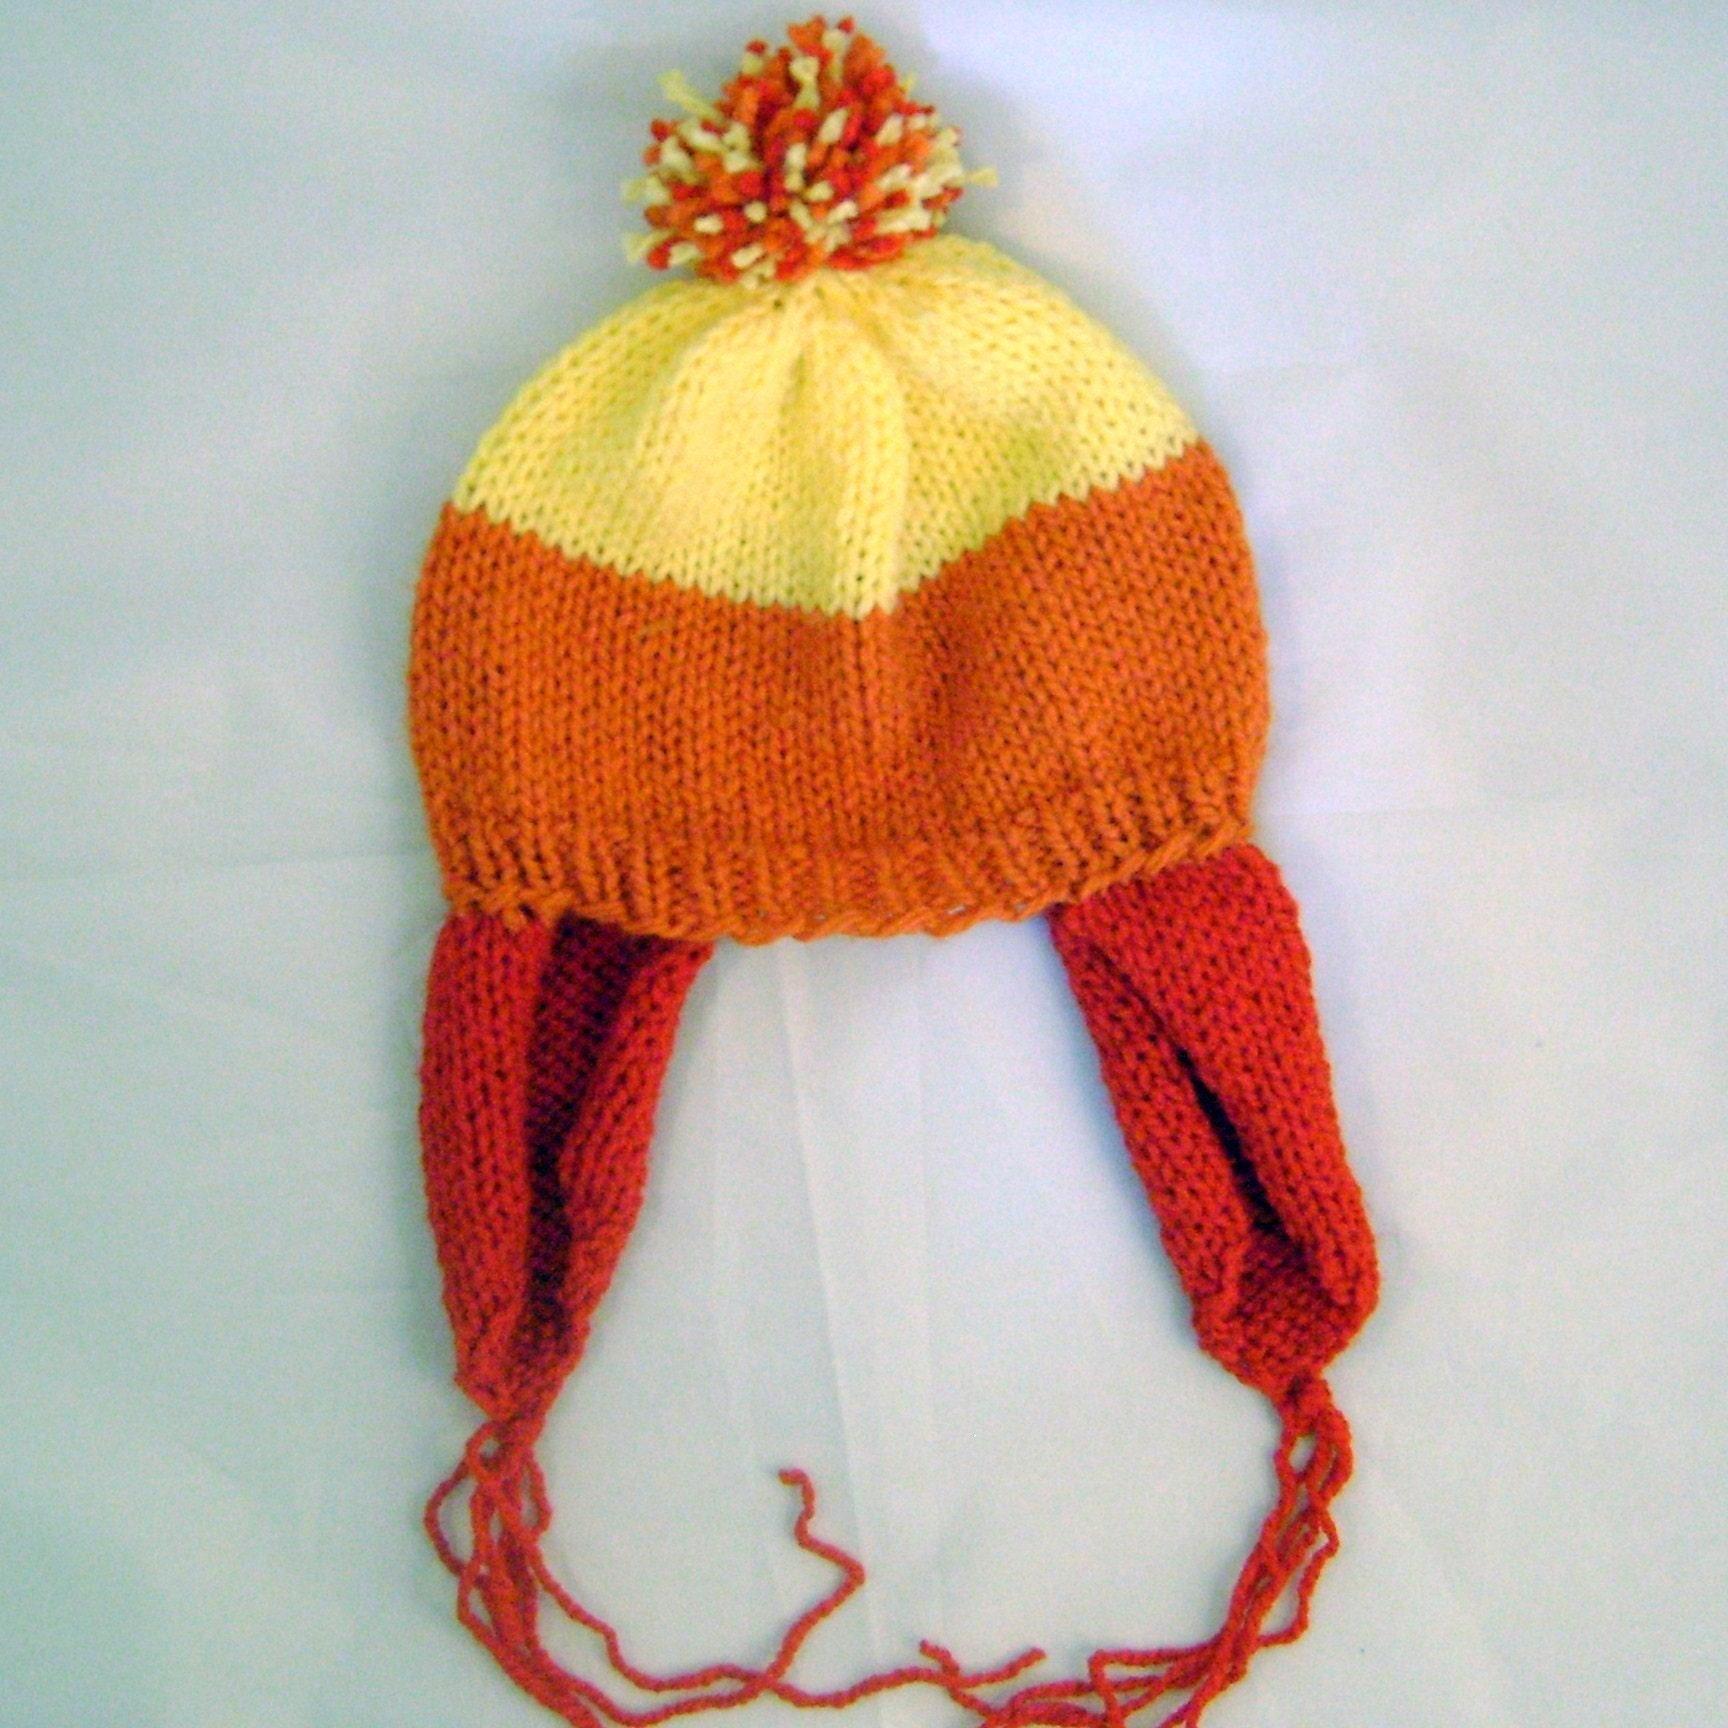 Redheart Knitting Patterns : Jayne Cobb Knit Hat